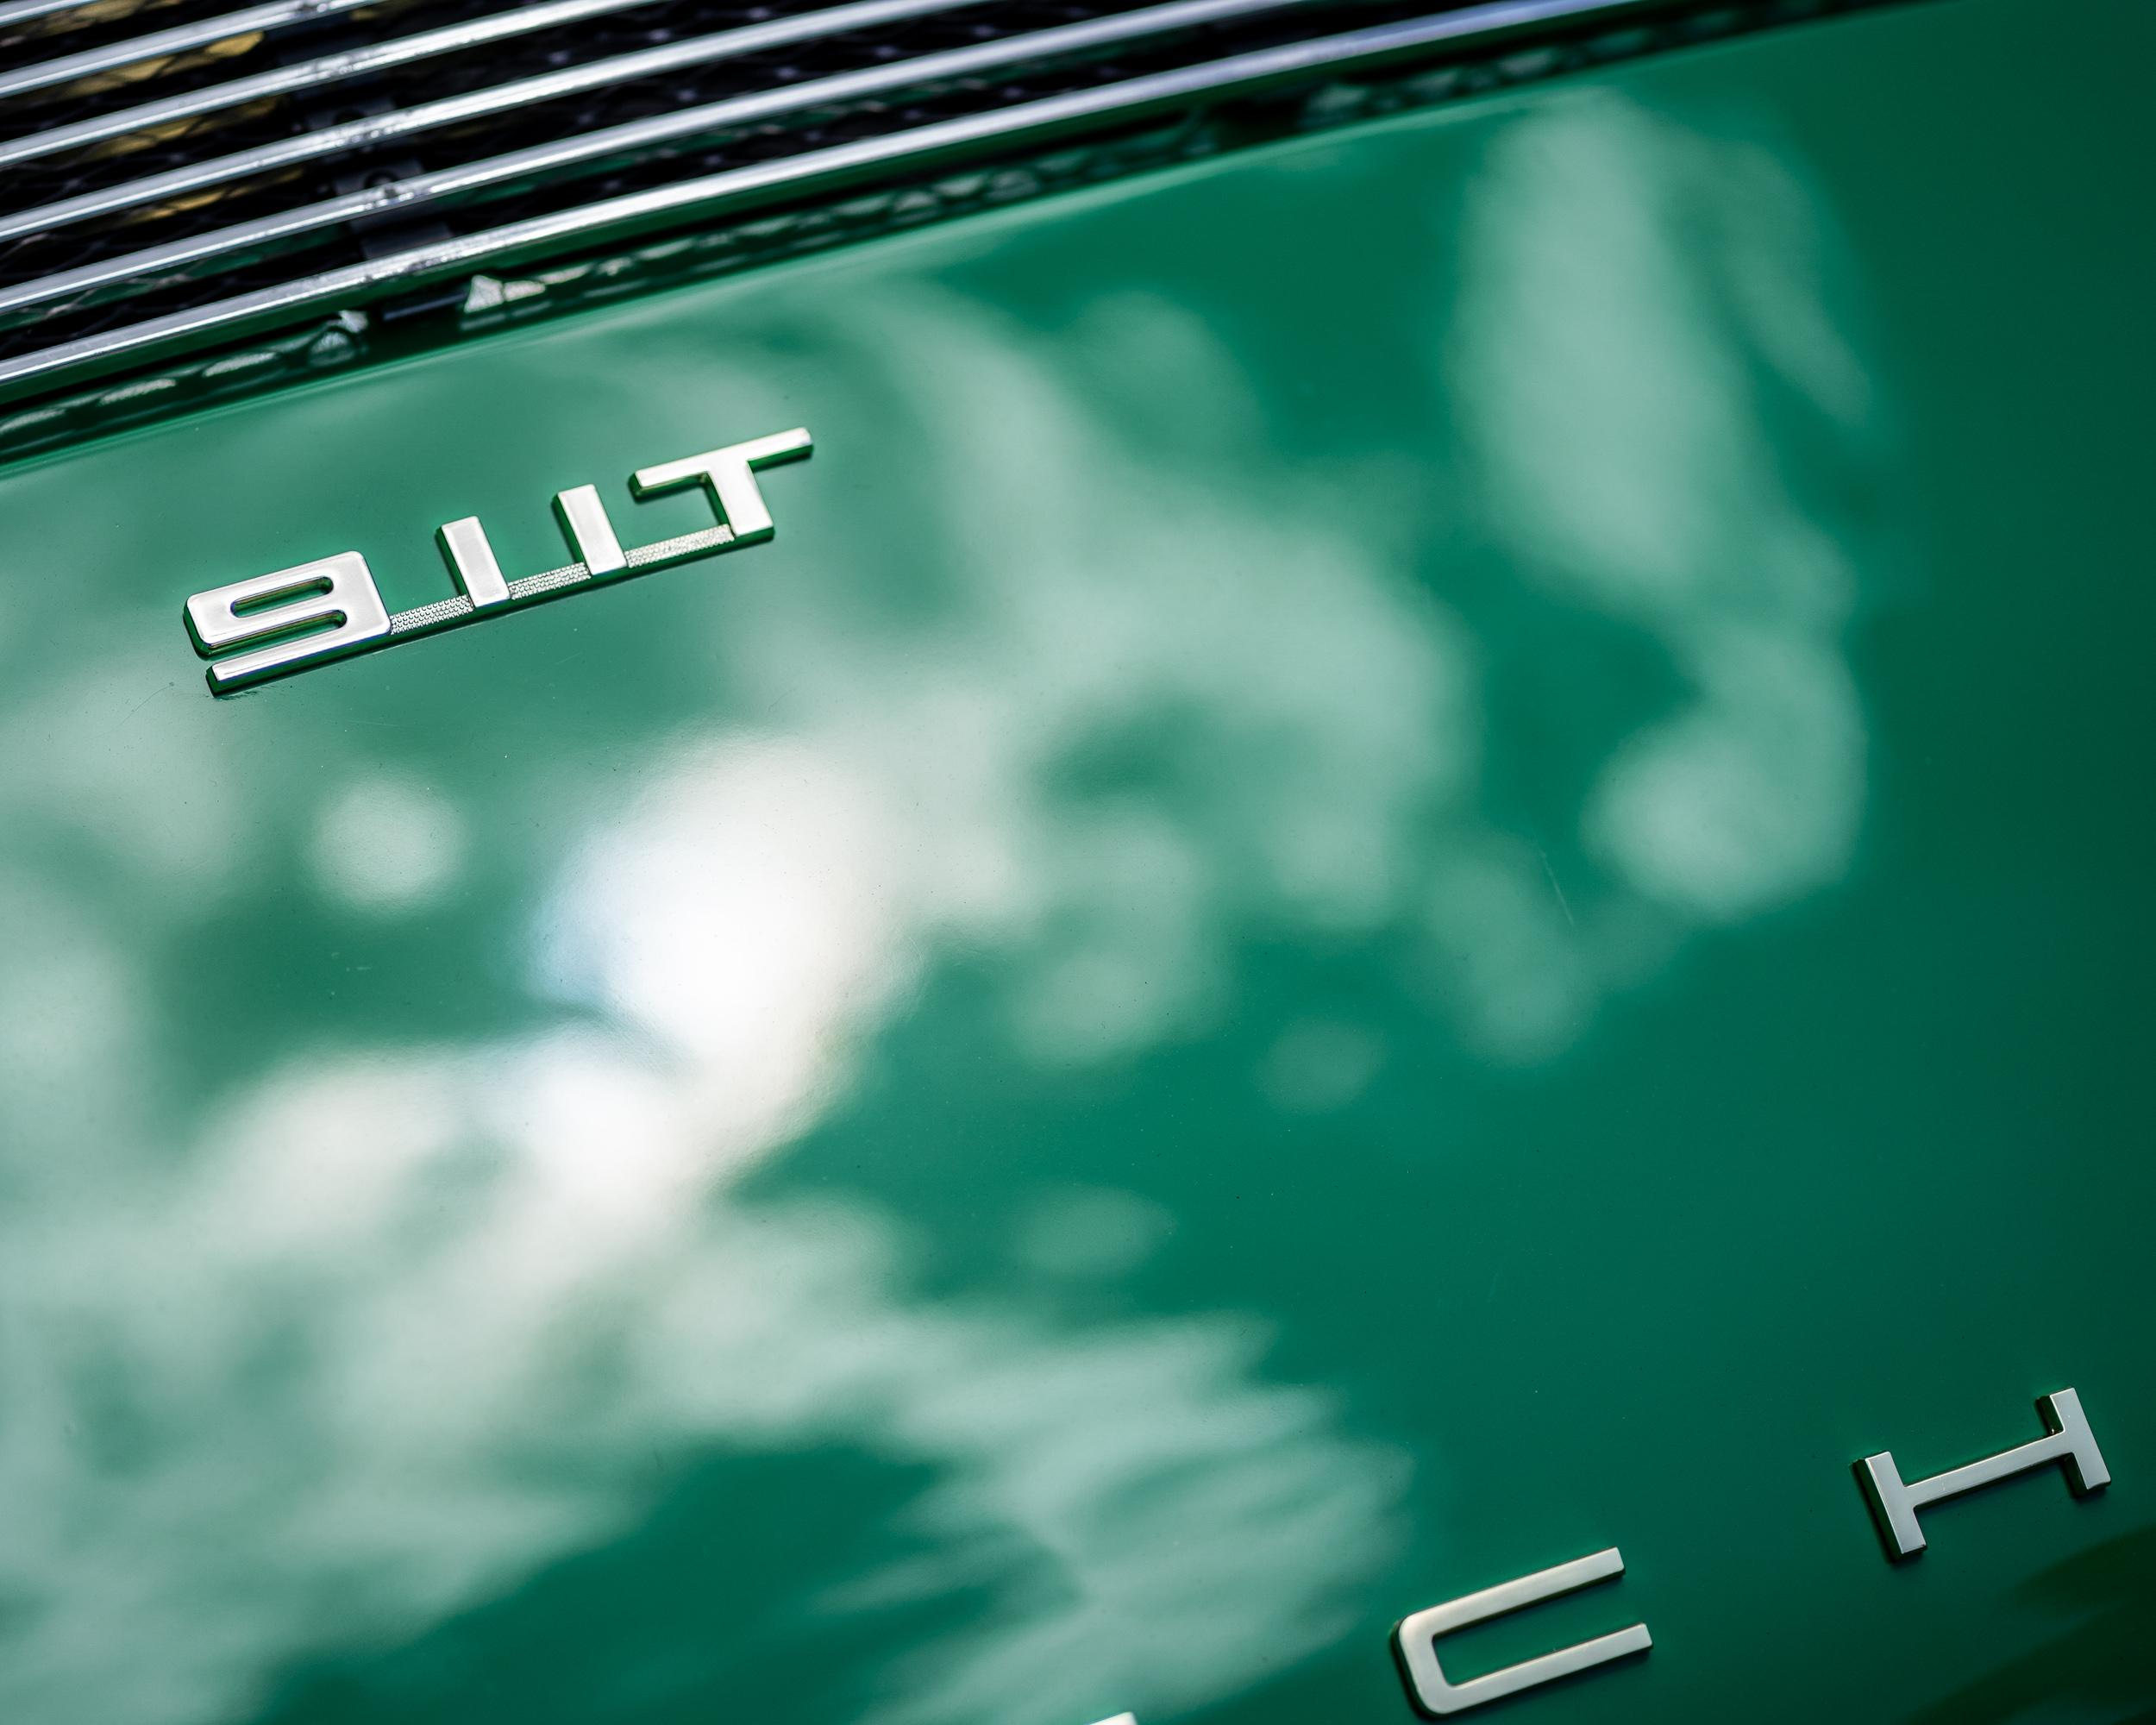 911t porsche detail luft 6 universal studios